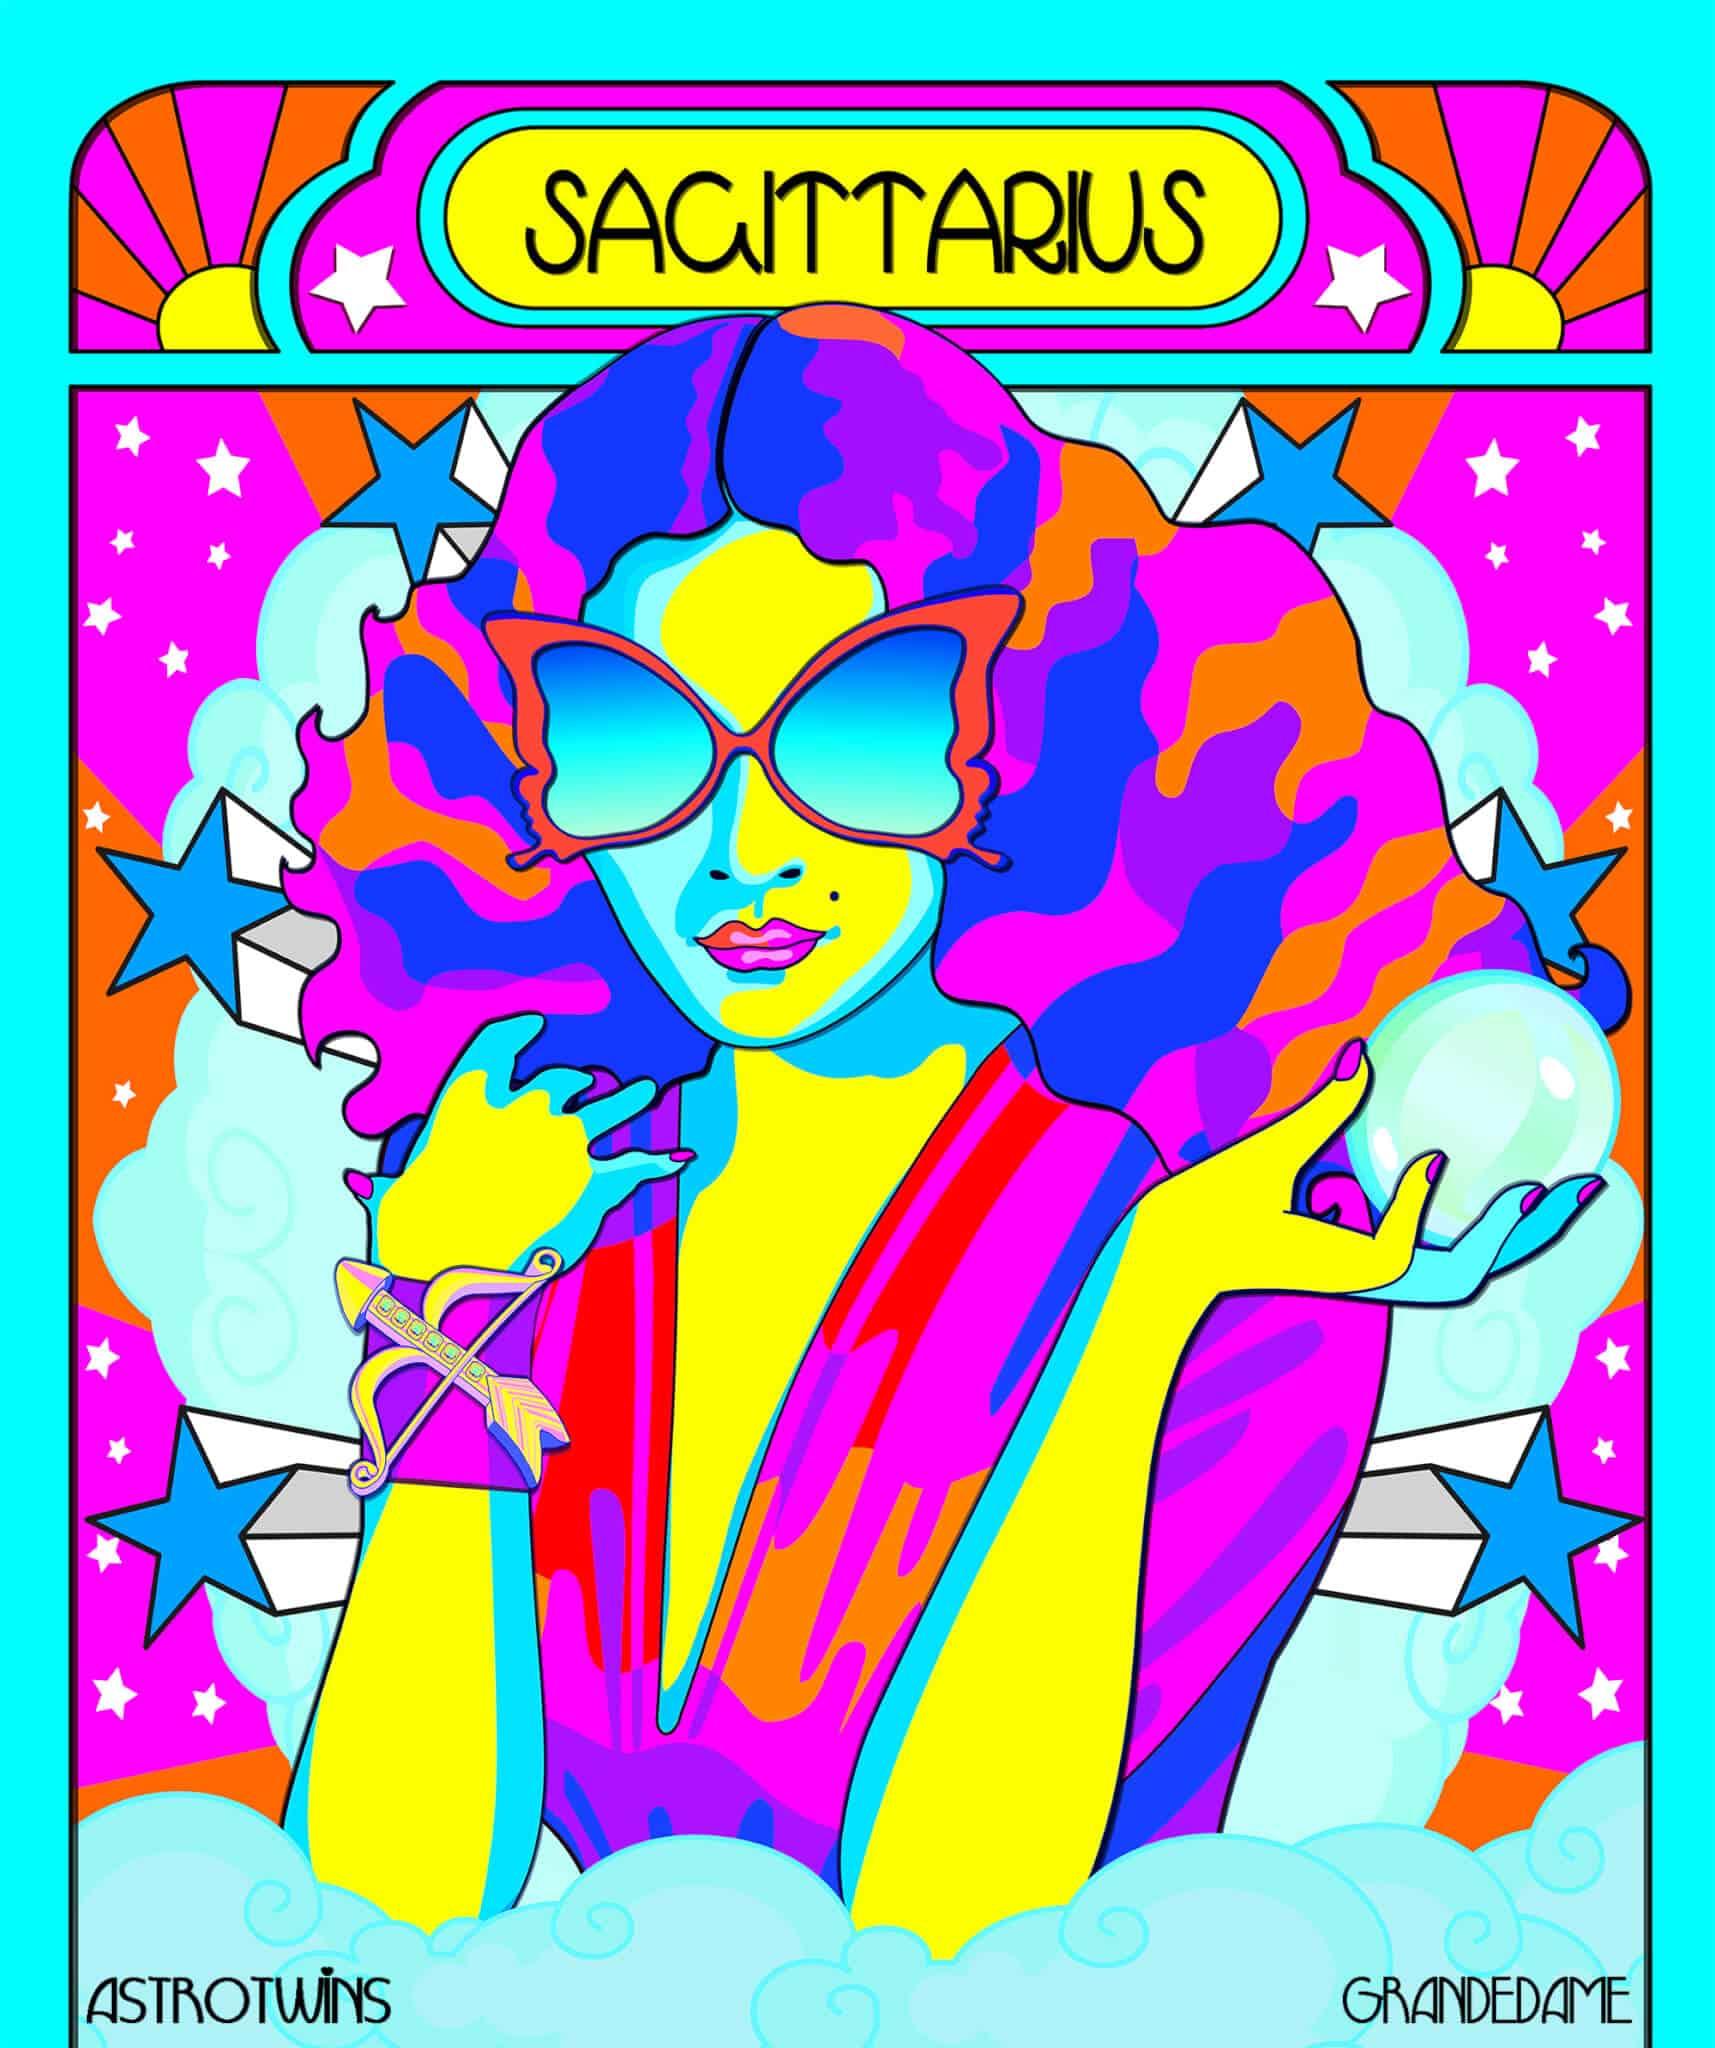 woman representing Sagittarius season 2020 in the zodiac of astrology